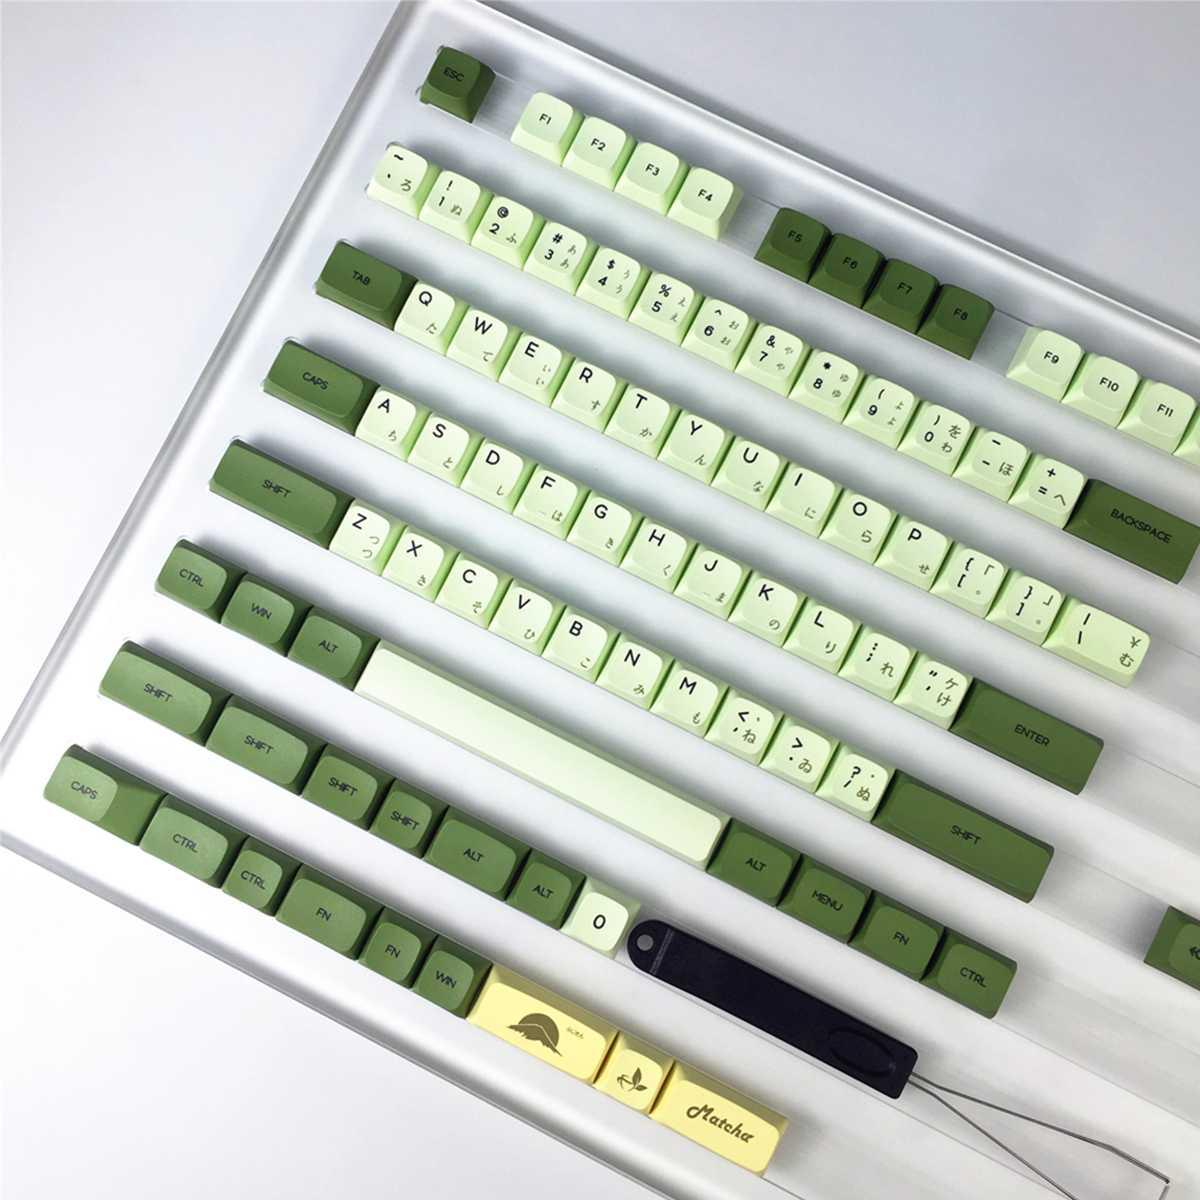 XDA شاي ماتشا أخضر الشاي صبغ الفرعية Keycap مجموعة 124 مفاتيح الشخصي PBT التسامي اليابانية/الكورية/الروسية المفاتيح للوحة المفاتيح الميكانيكية